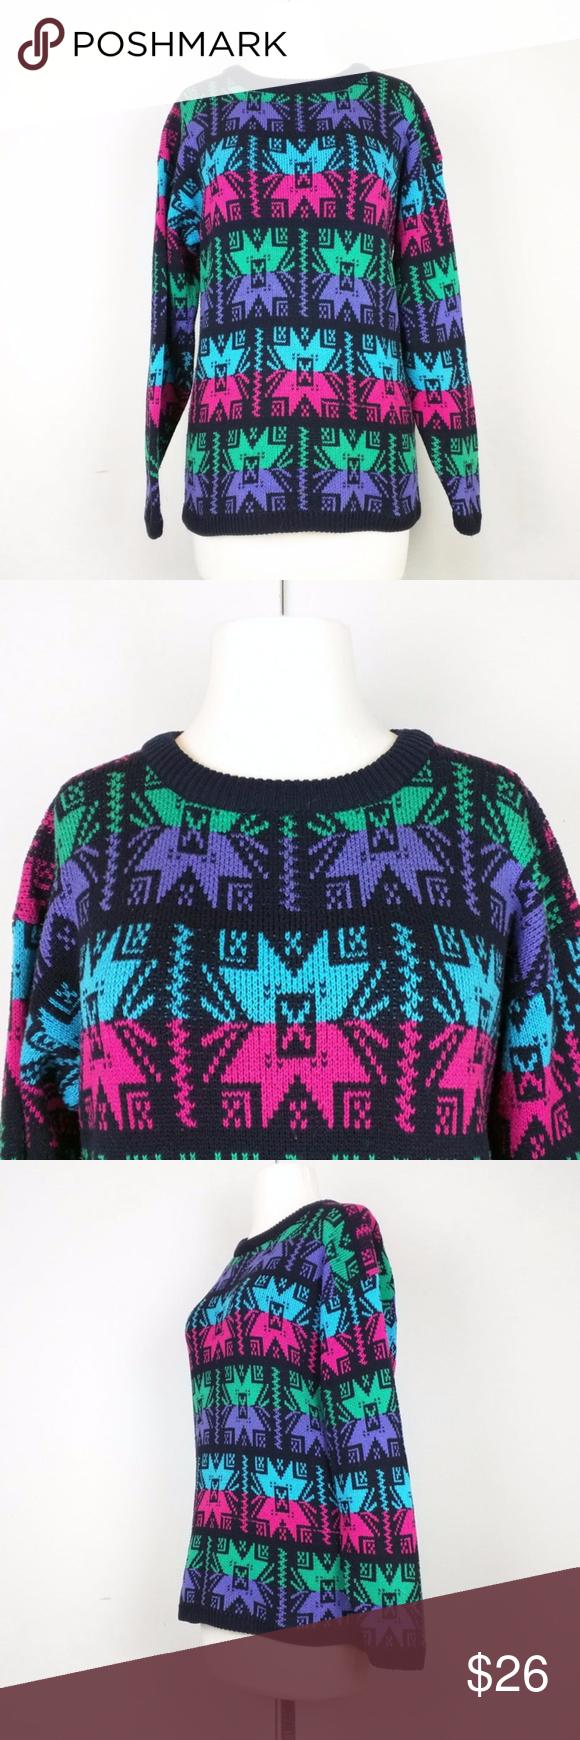 Vintage Black Colorful Snowflake Knit Sweater Black, pink, purple ...